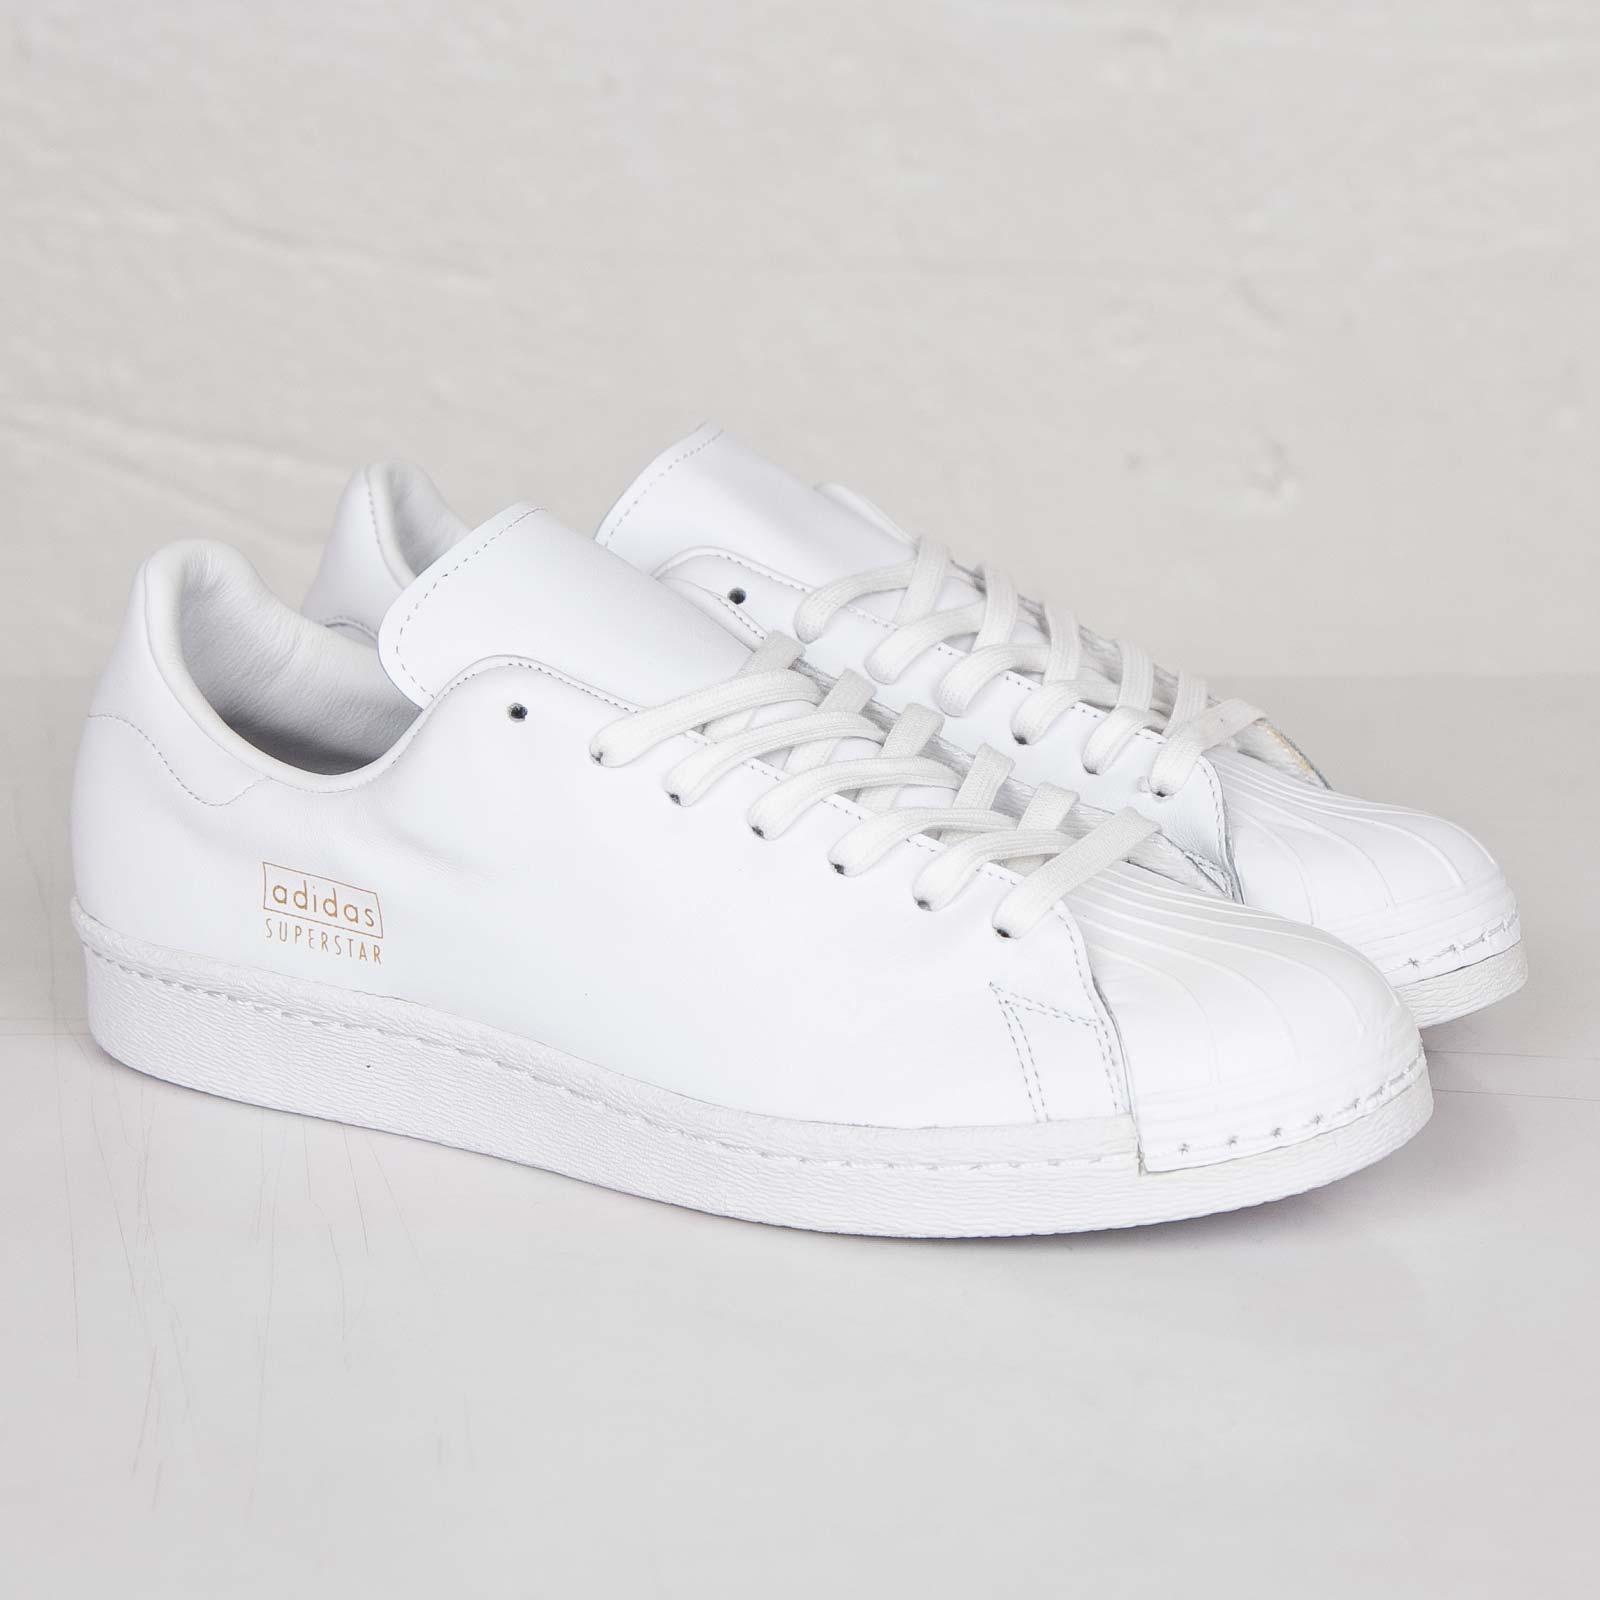 adidas Superstar 80S Clean - B25856